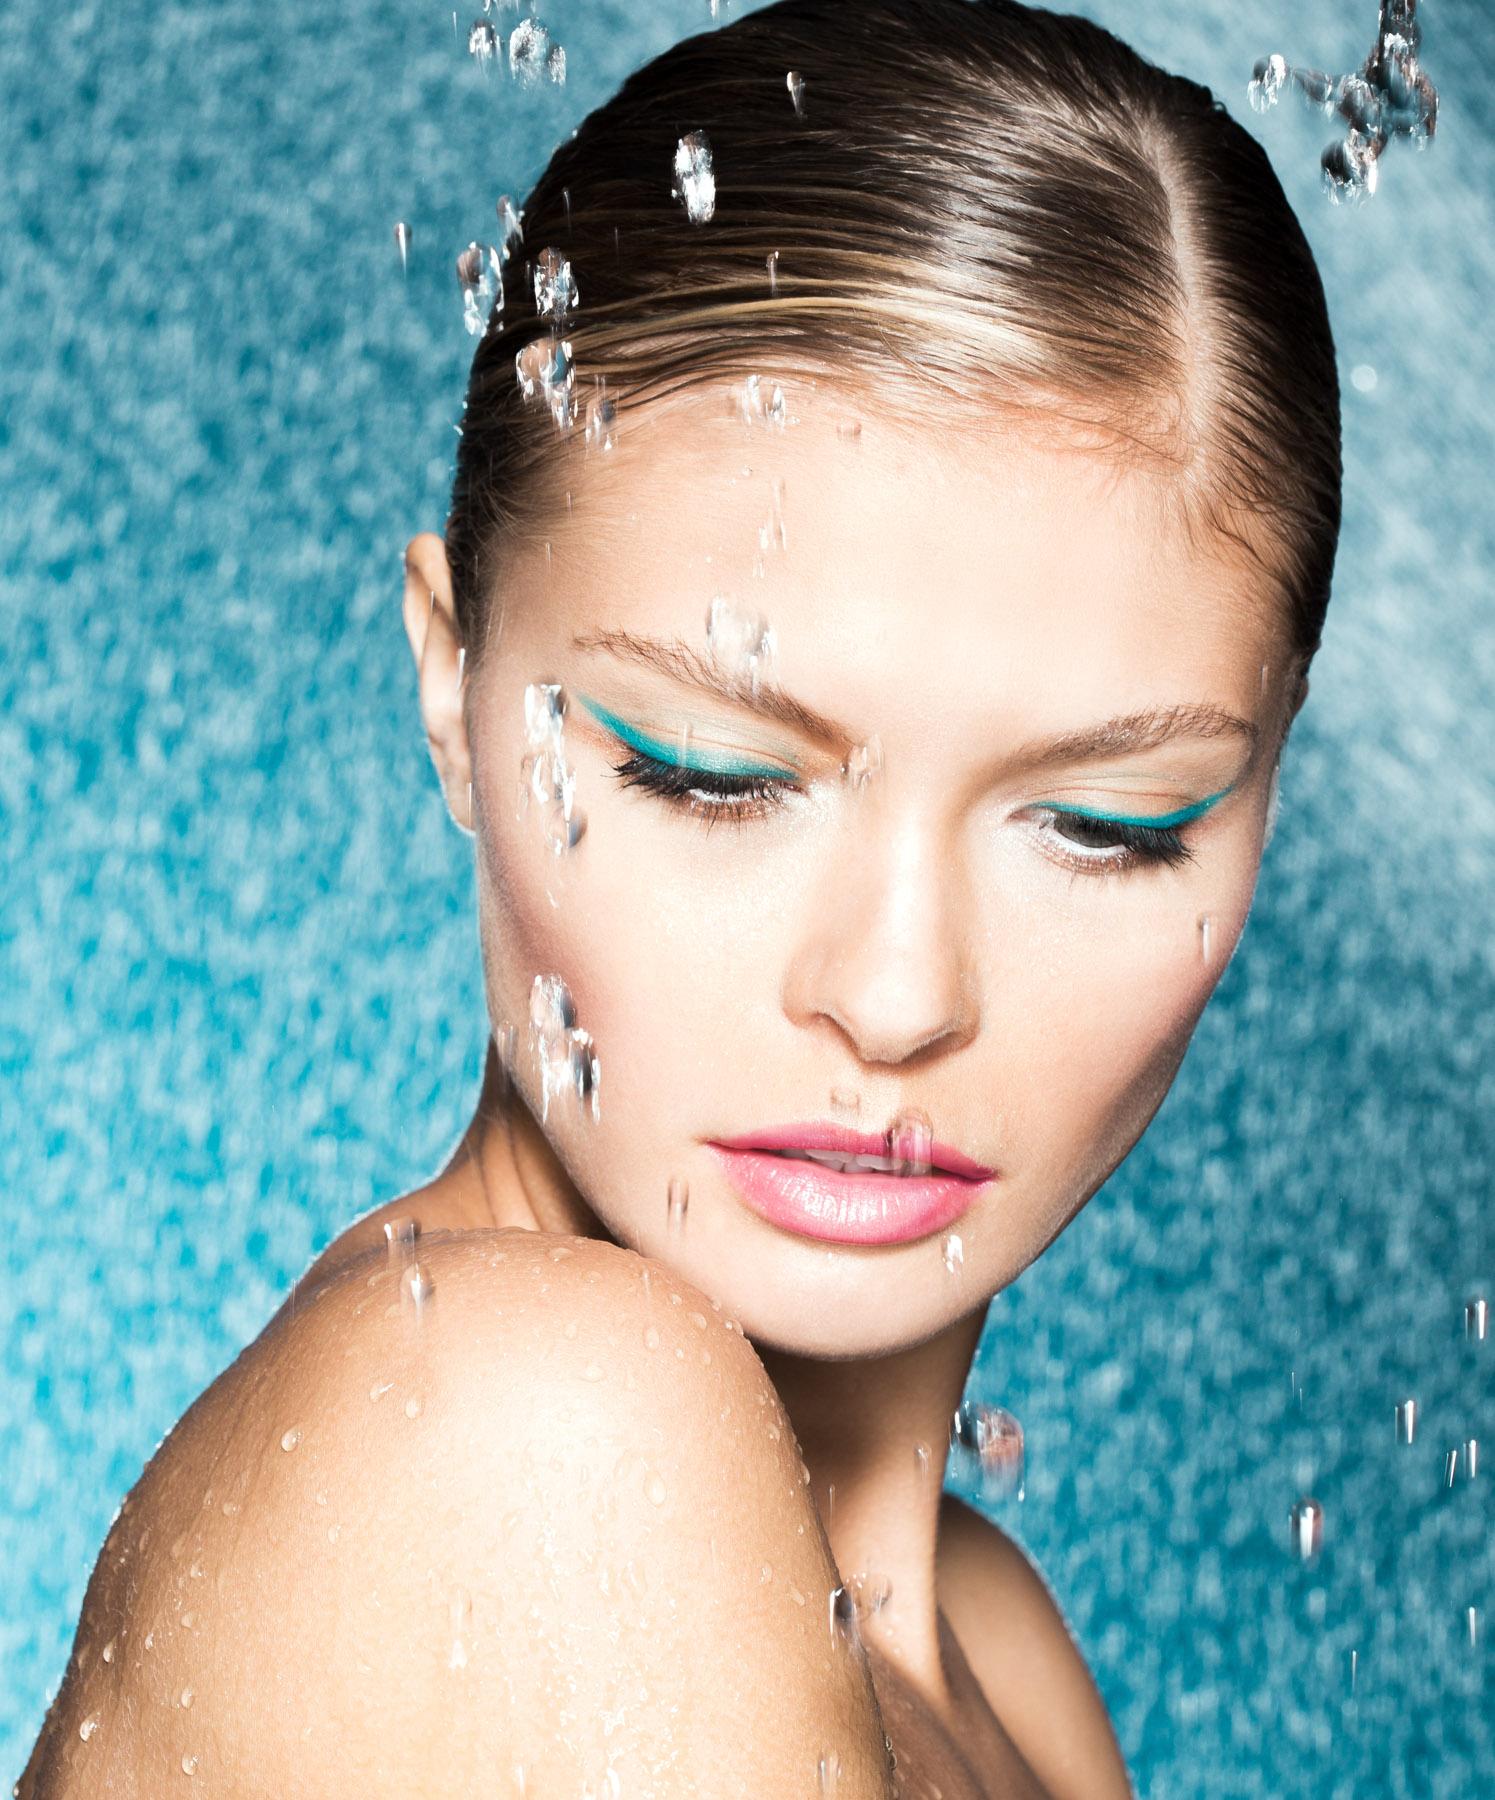 Karstadt Desirée, Trend Magazine Beauty